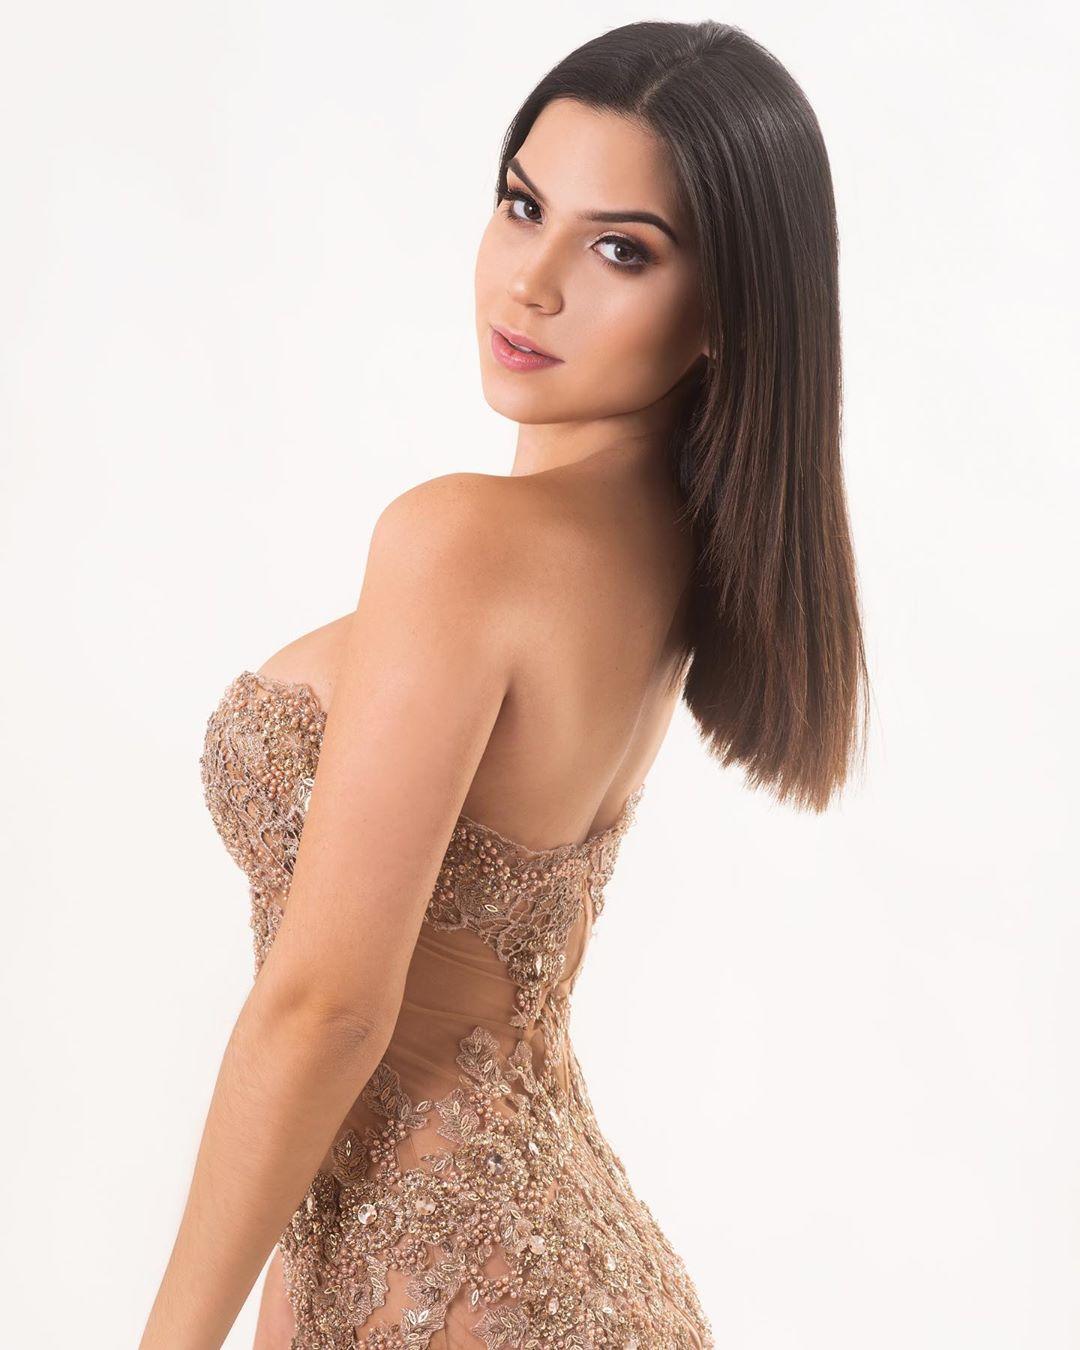 micaela leon mandriotti, miss peru latinoamerica 2019. 67194810